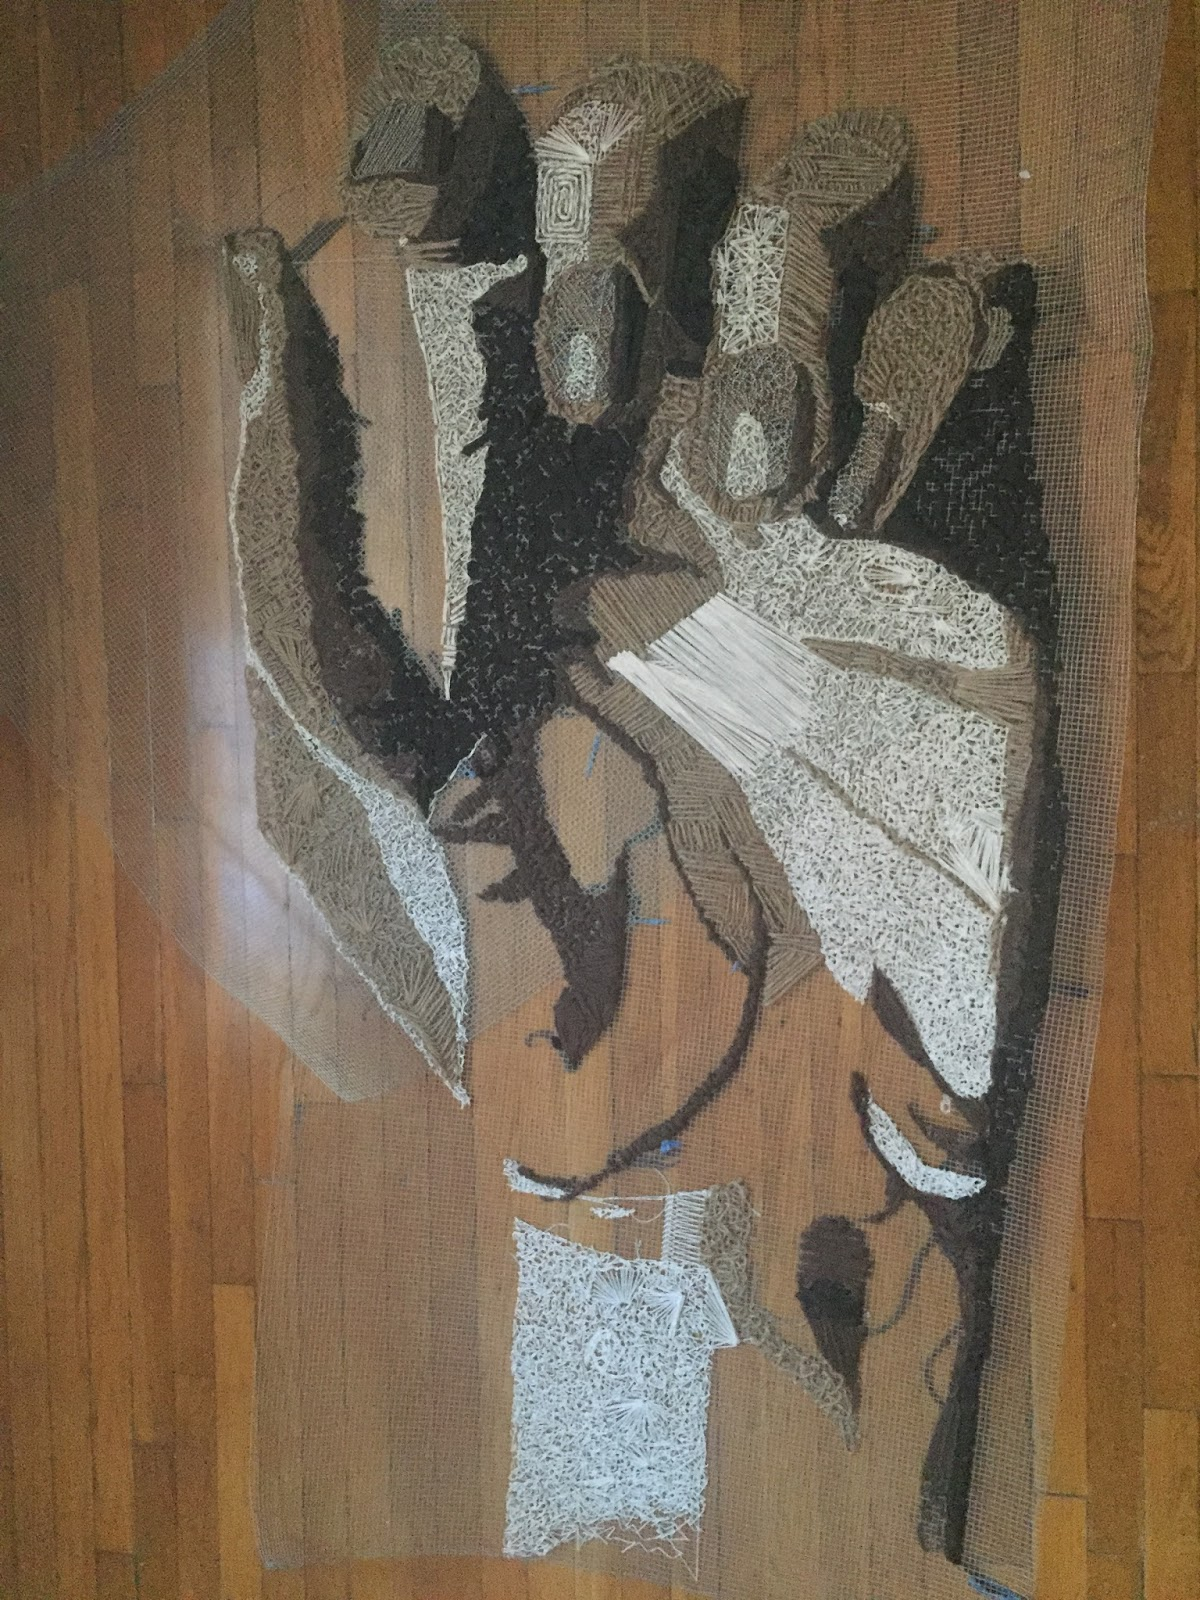 art | Related Work